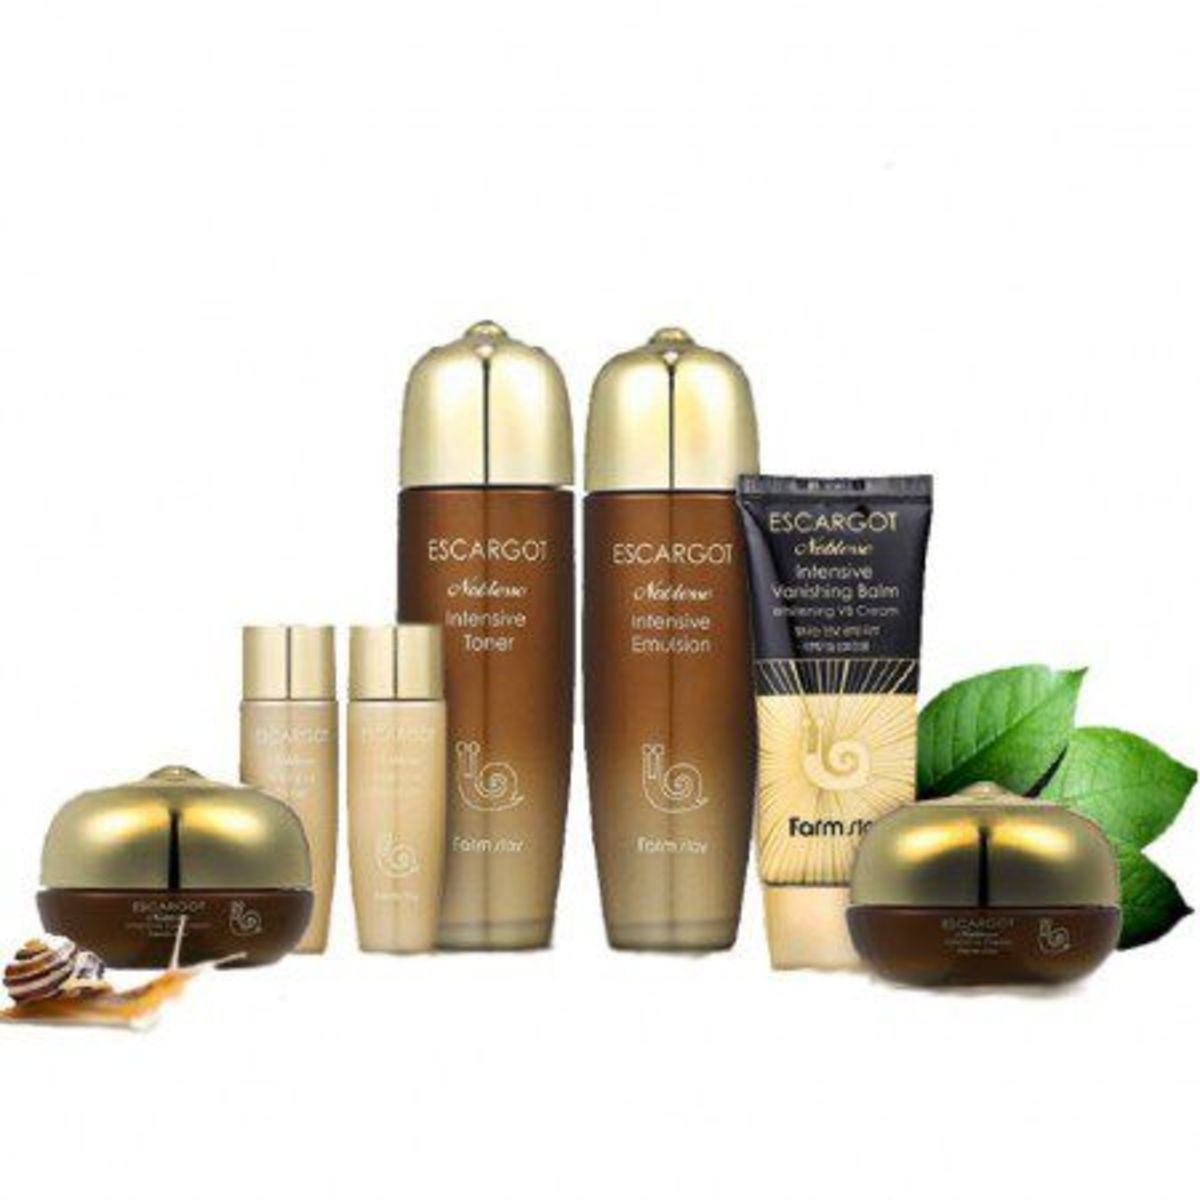 ESCARGOT Noblesse Intensive Skin Care Set (5pcs/set)